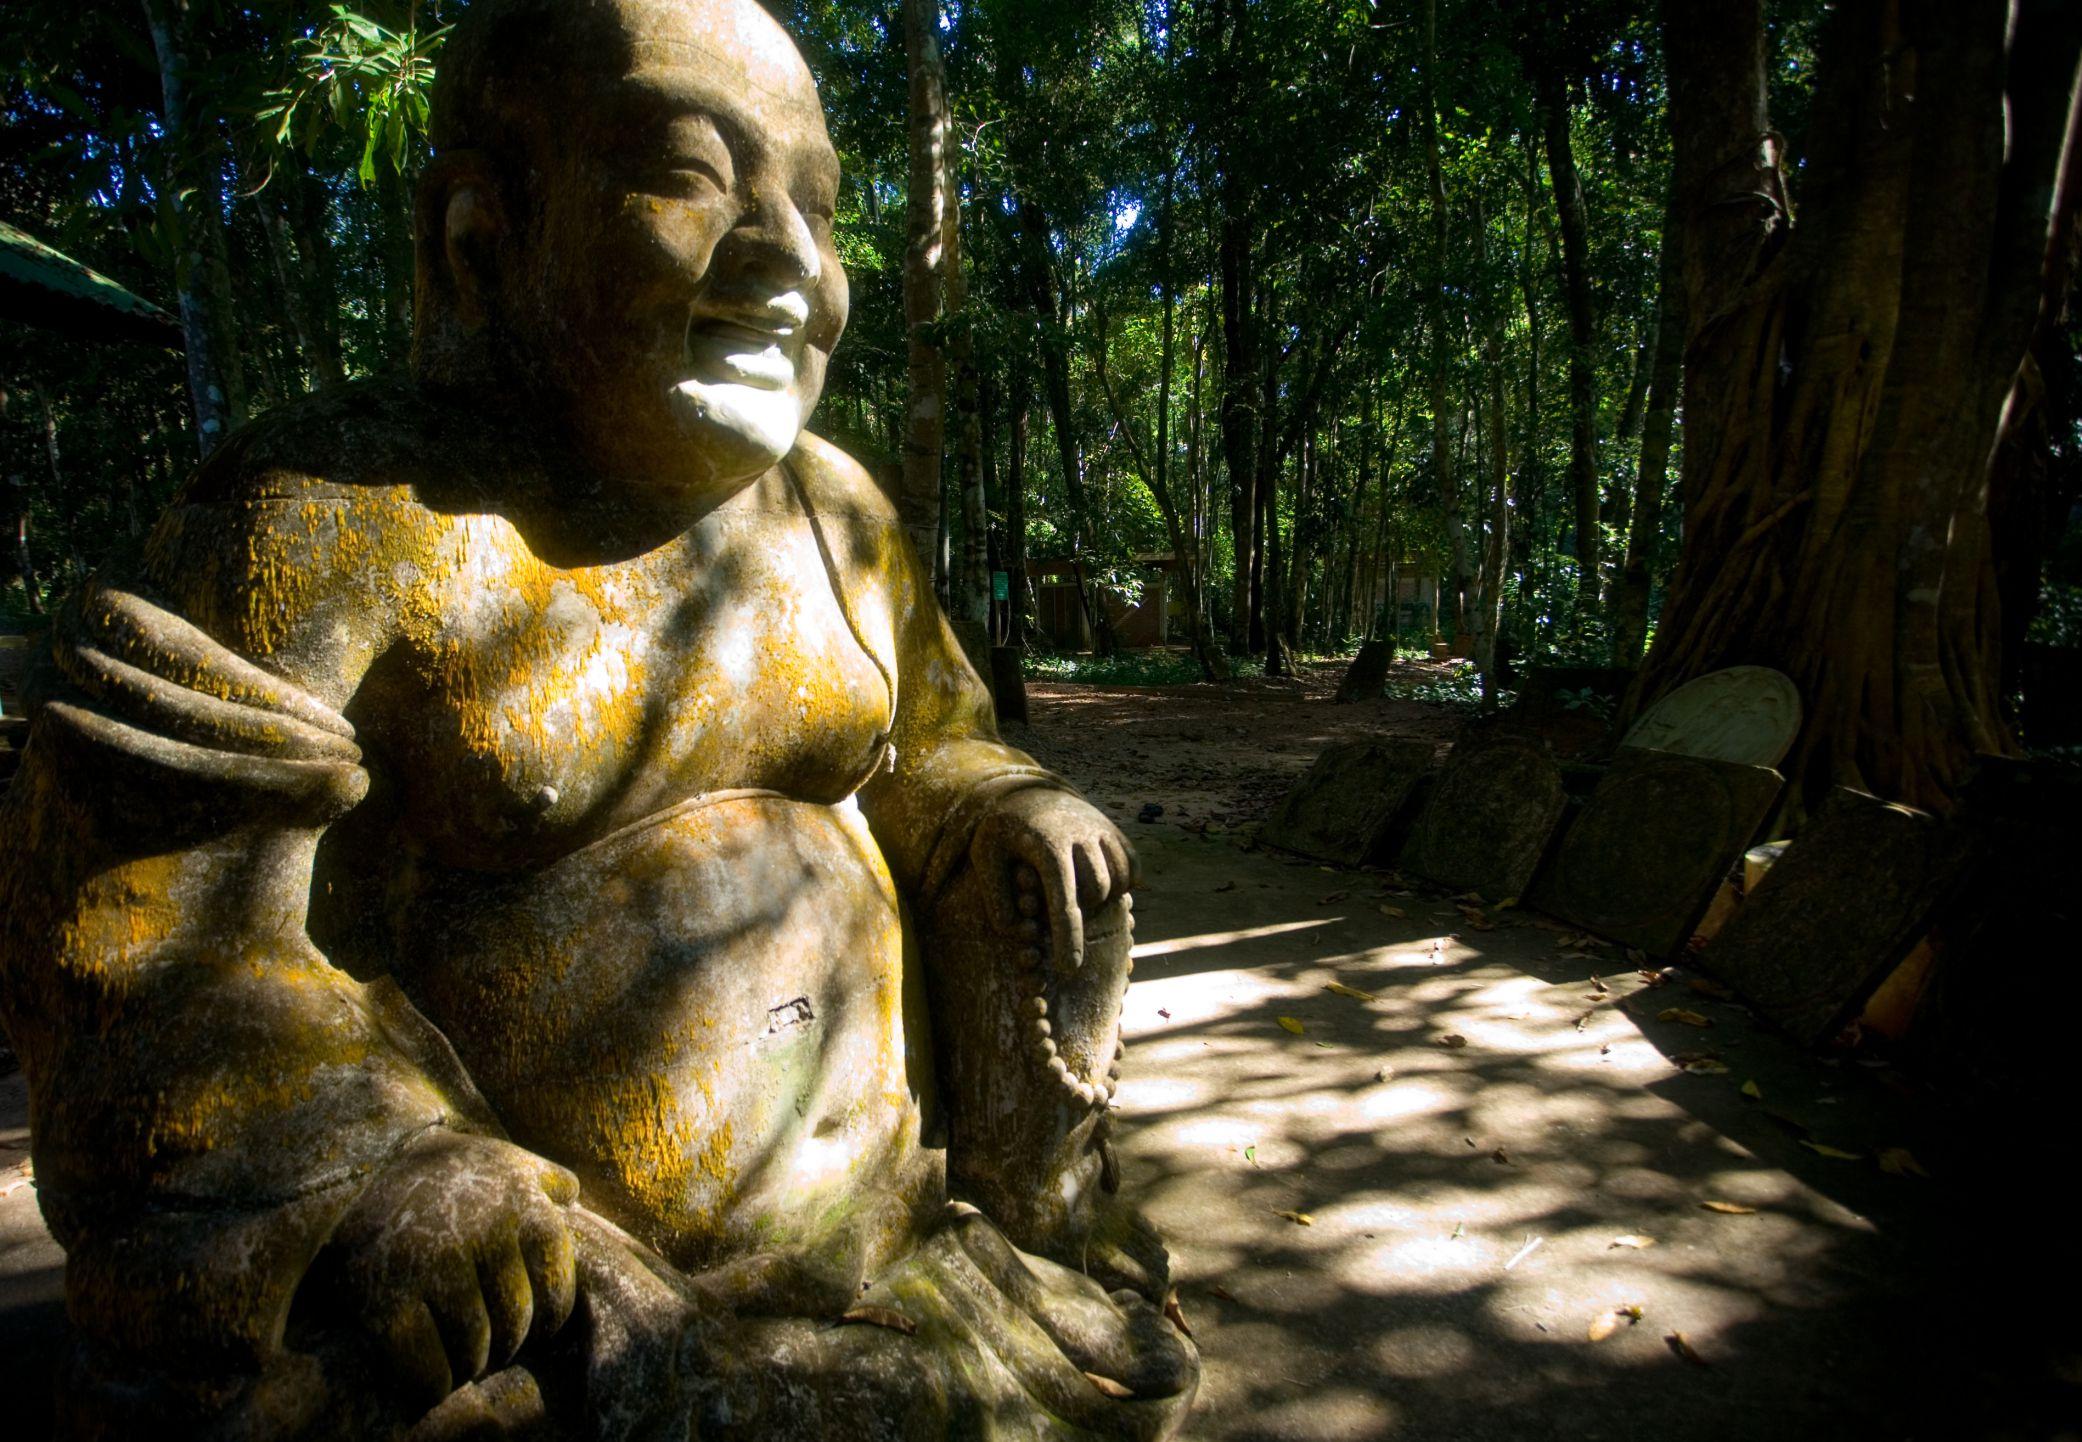 The Life of the Buddha, Siddhartha Gautama